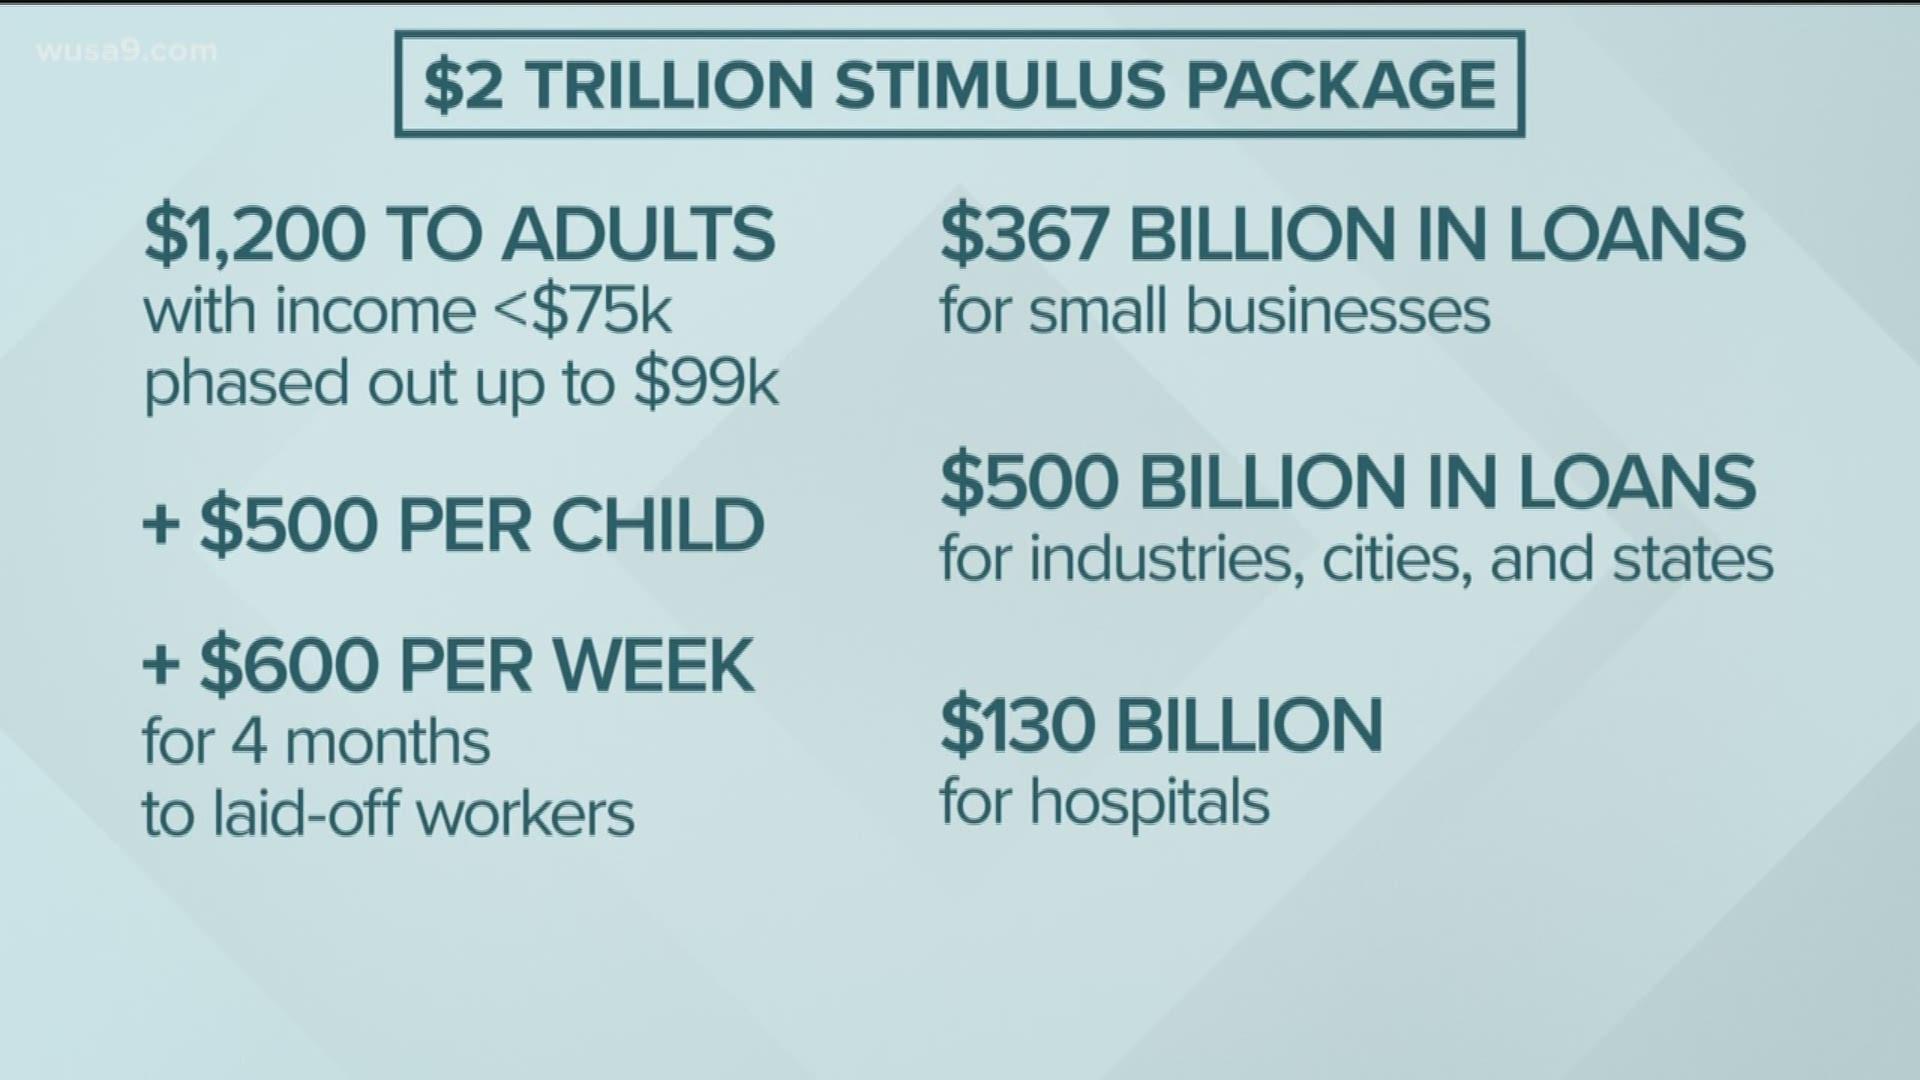 Maryland To Get 2 3 Billion In Coronavirus Stimulus Package Wusa9 Com